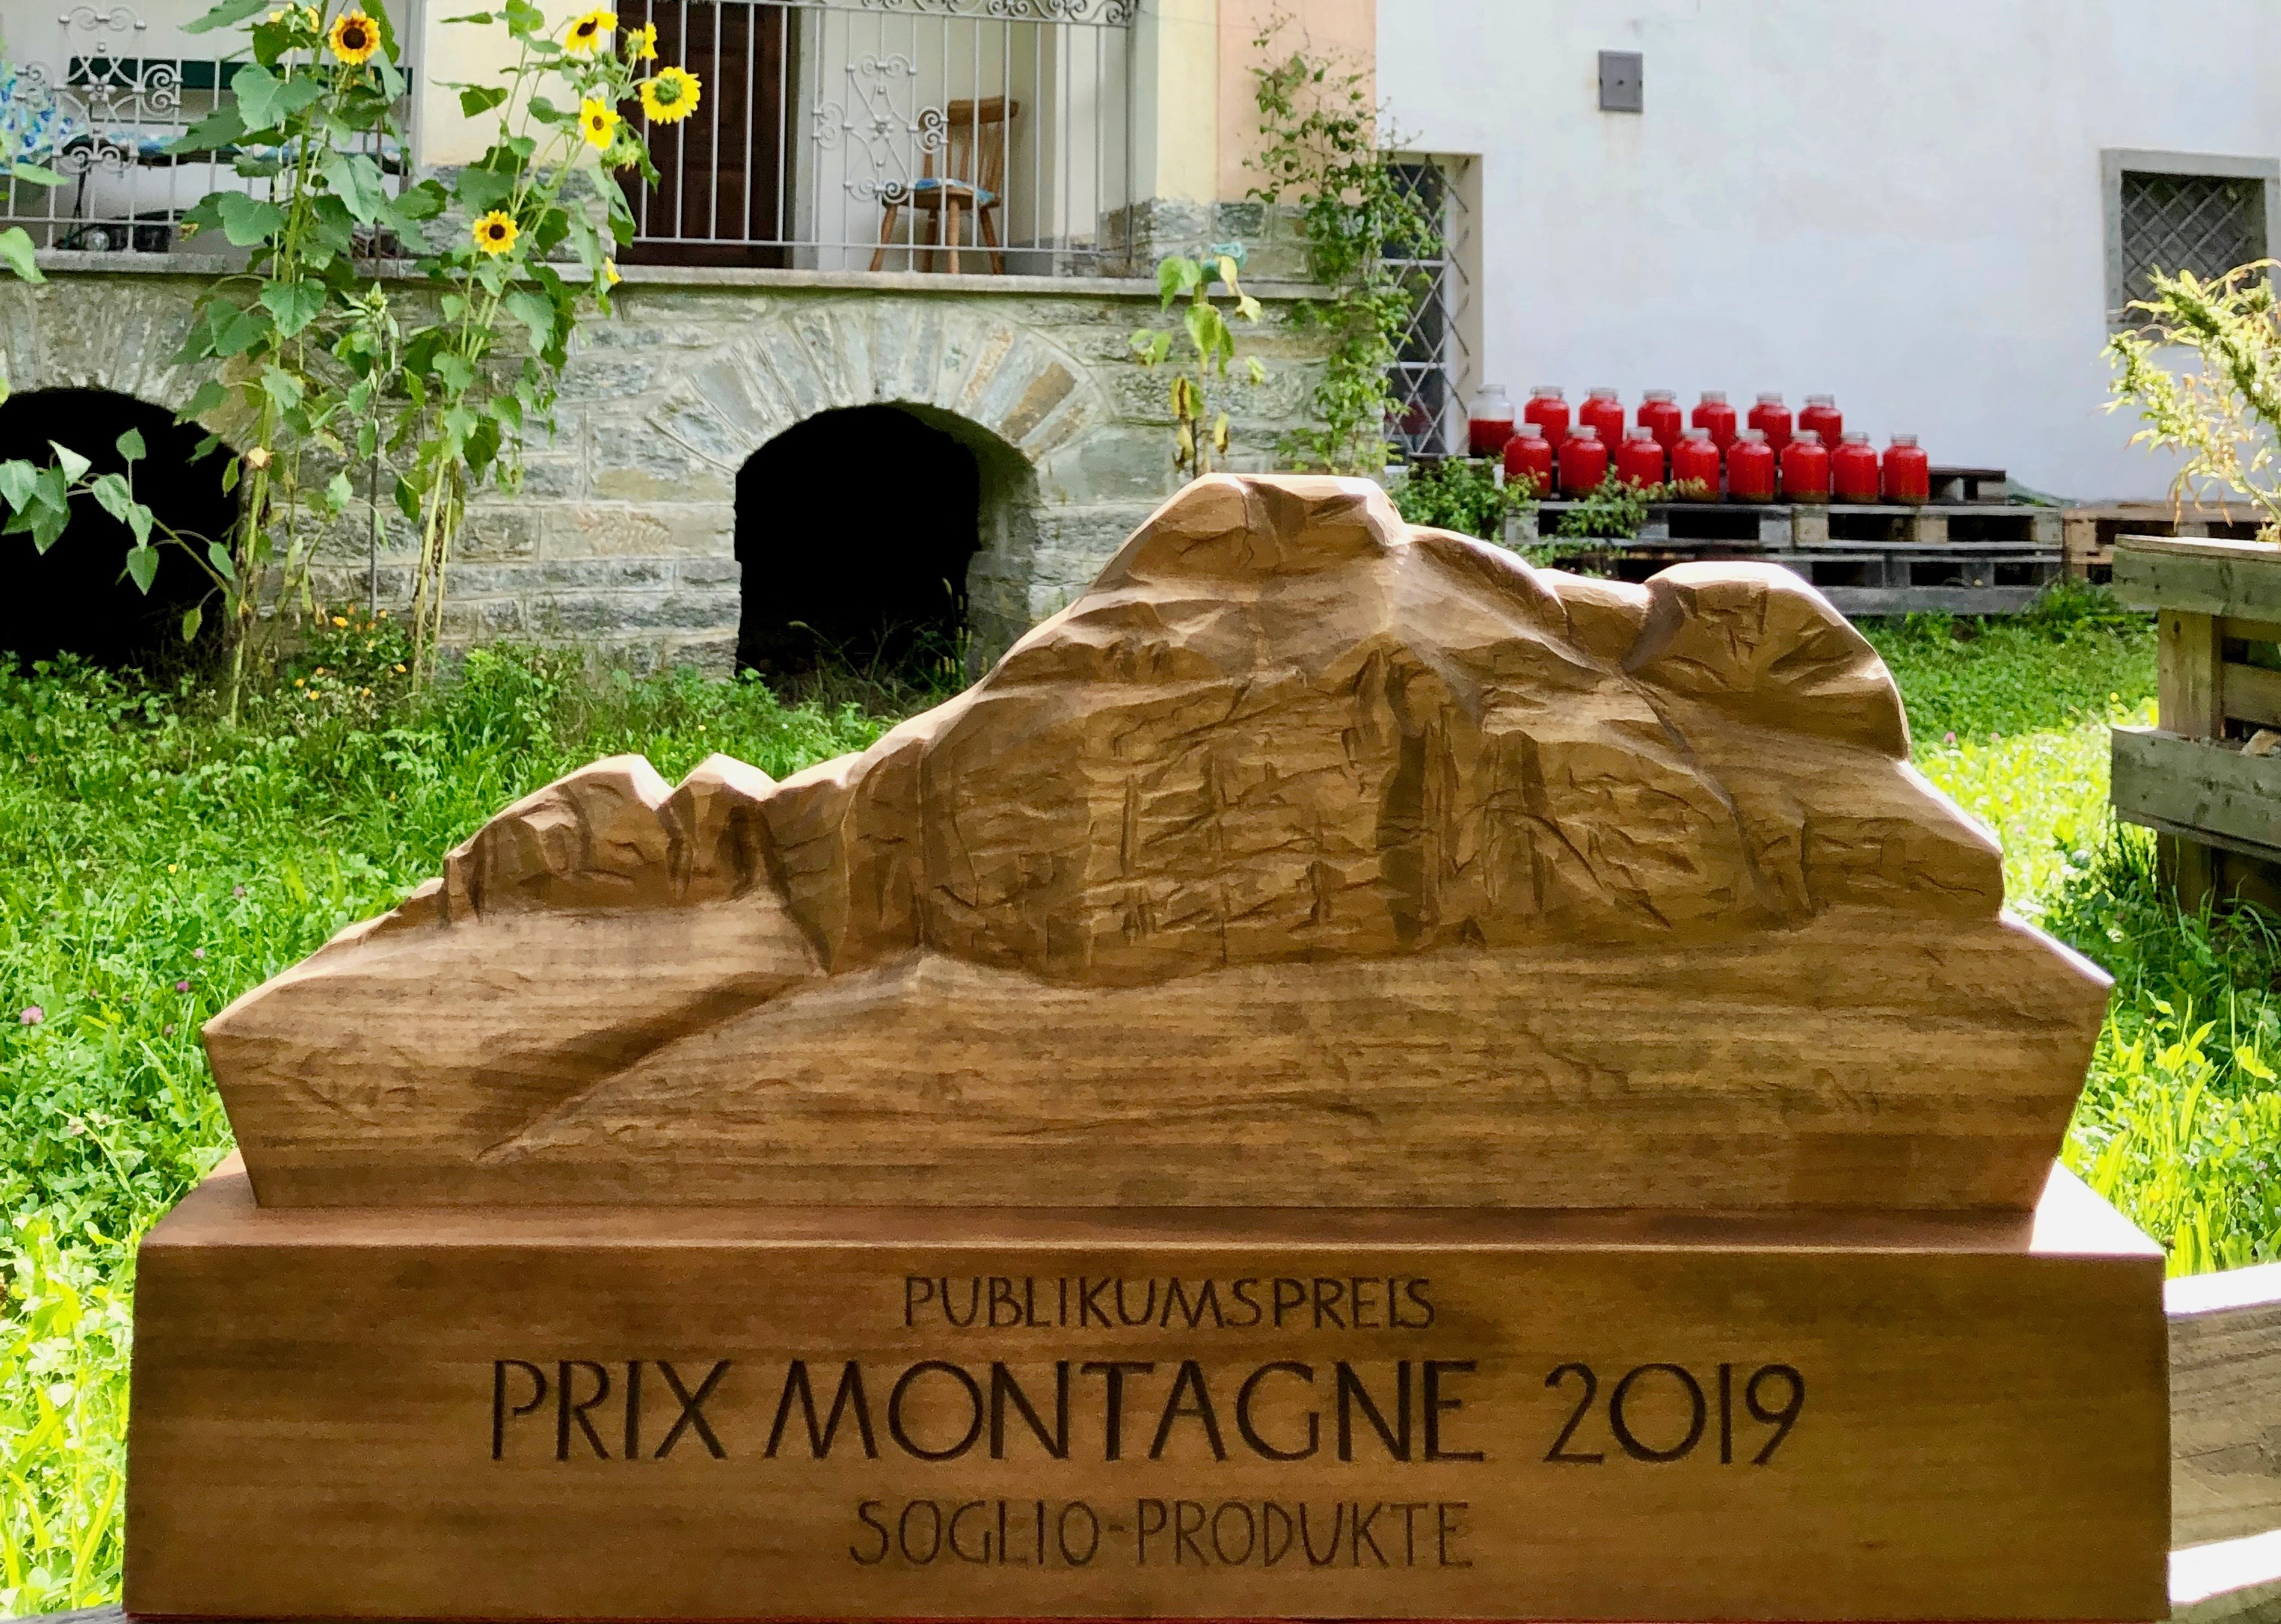 Prix Montagne 2019